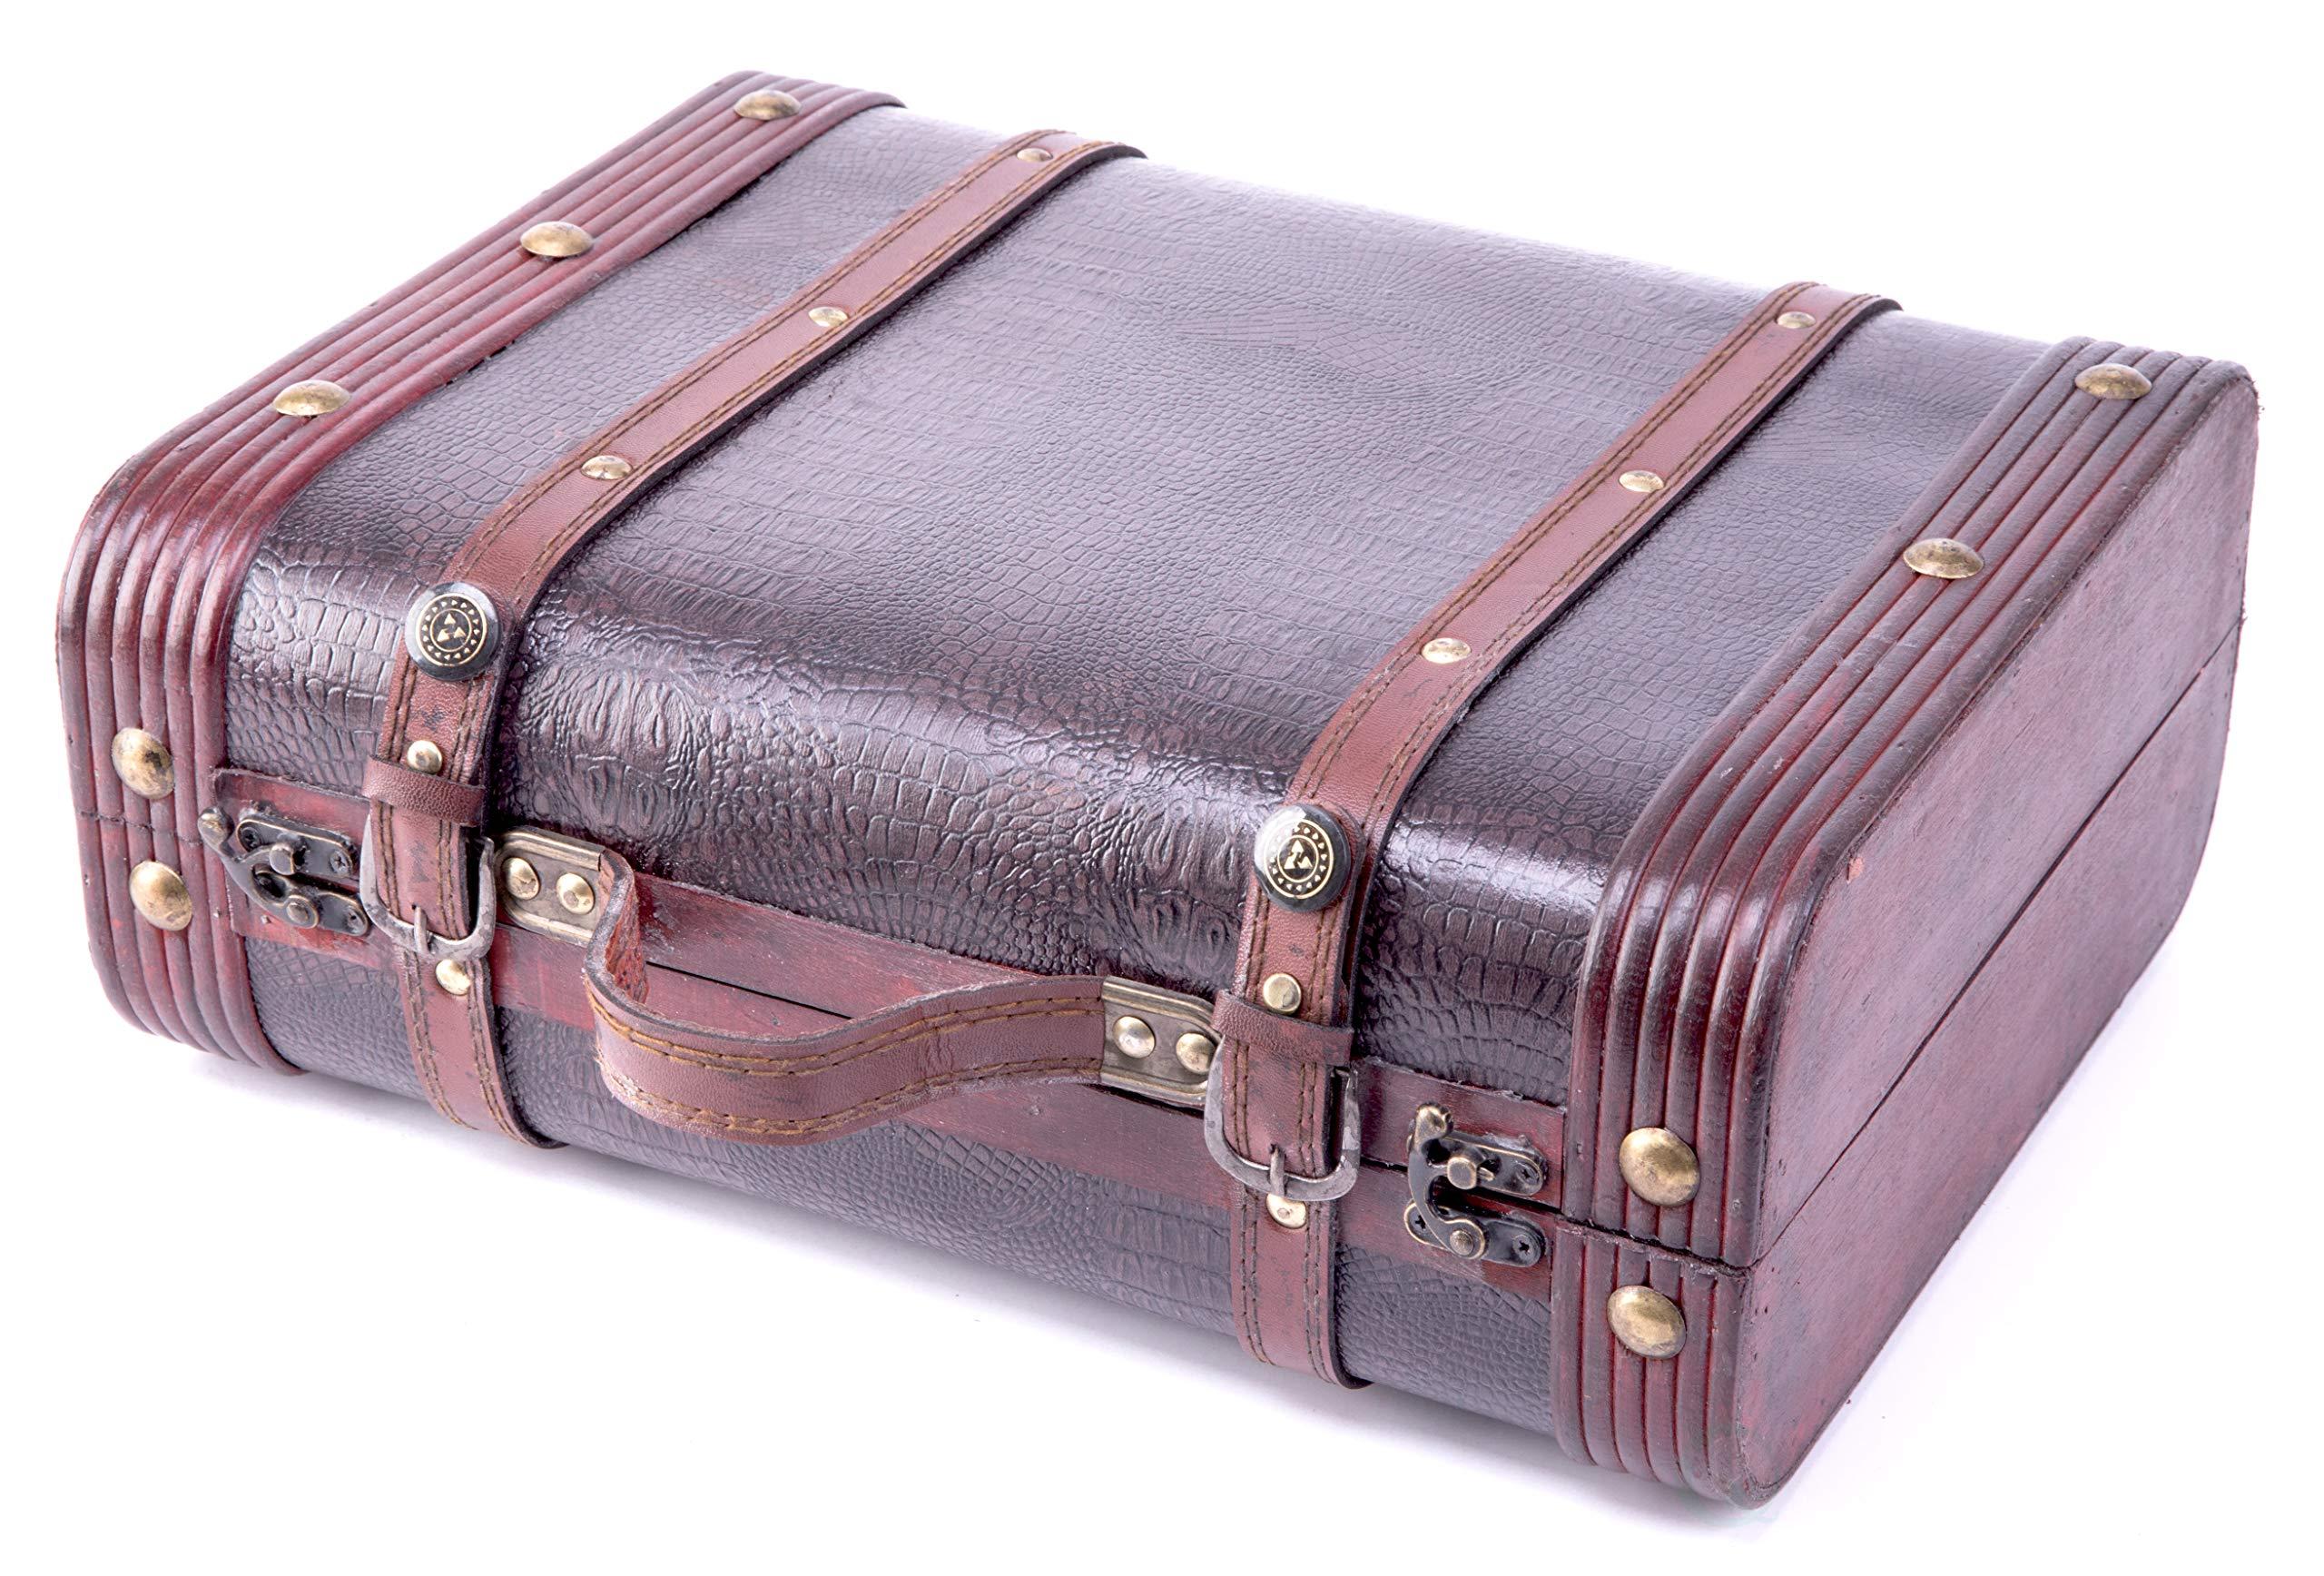 Vintiquewise(TM) Decorative Wooden Leather Suitcase by Vintiquewise